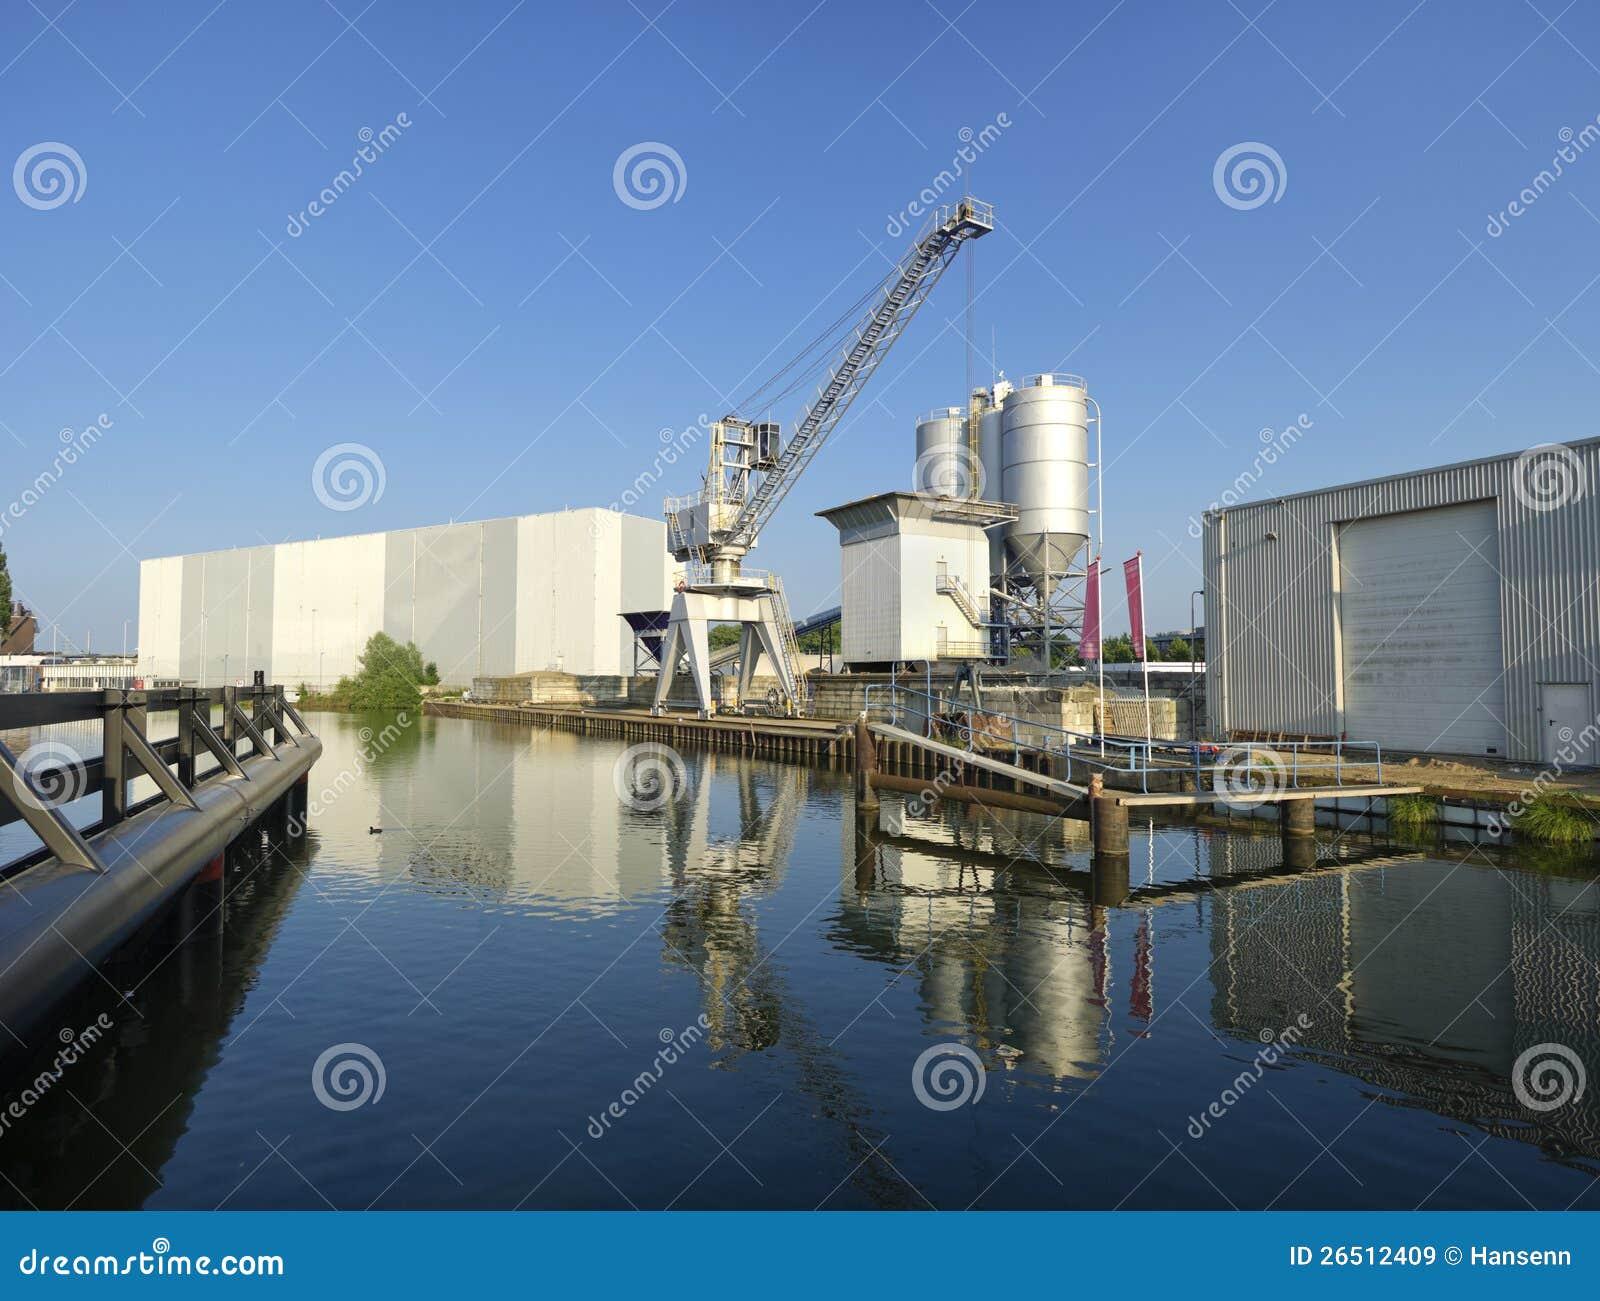 Cement factory business plan